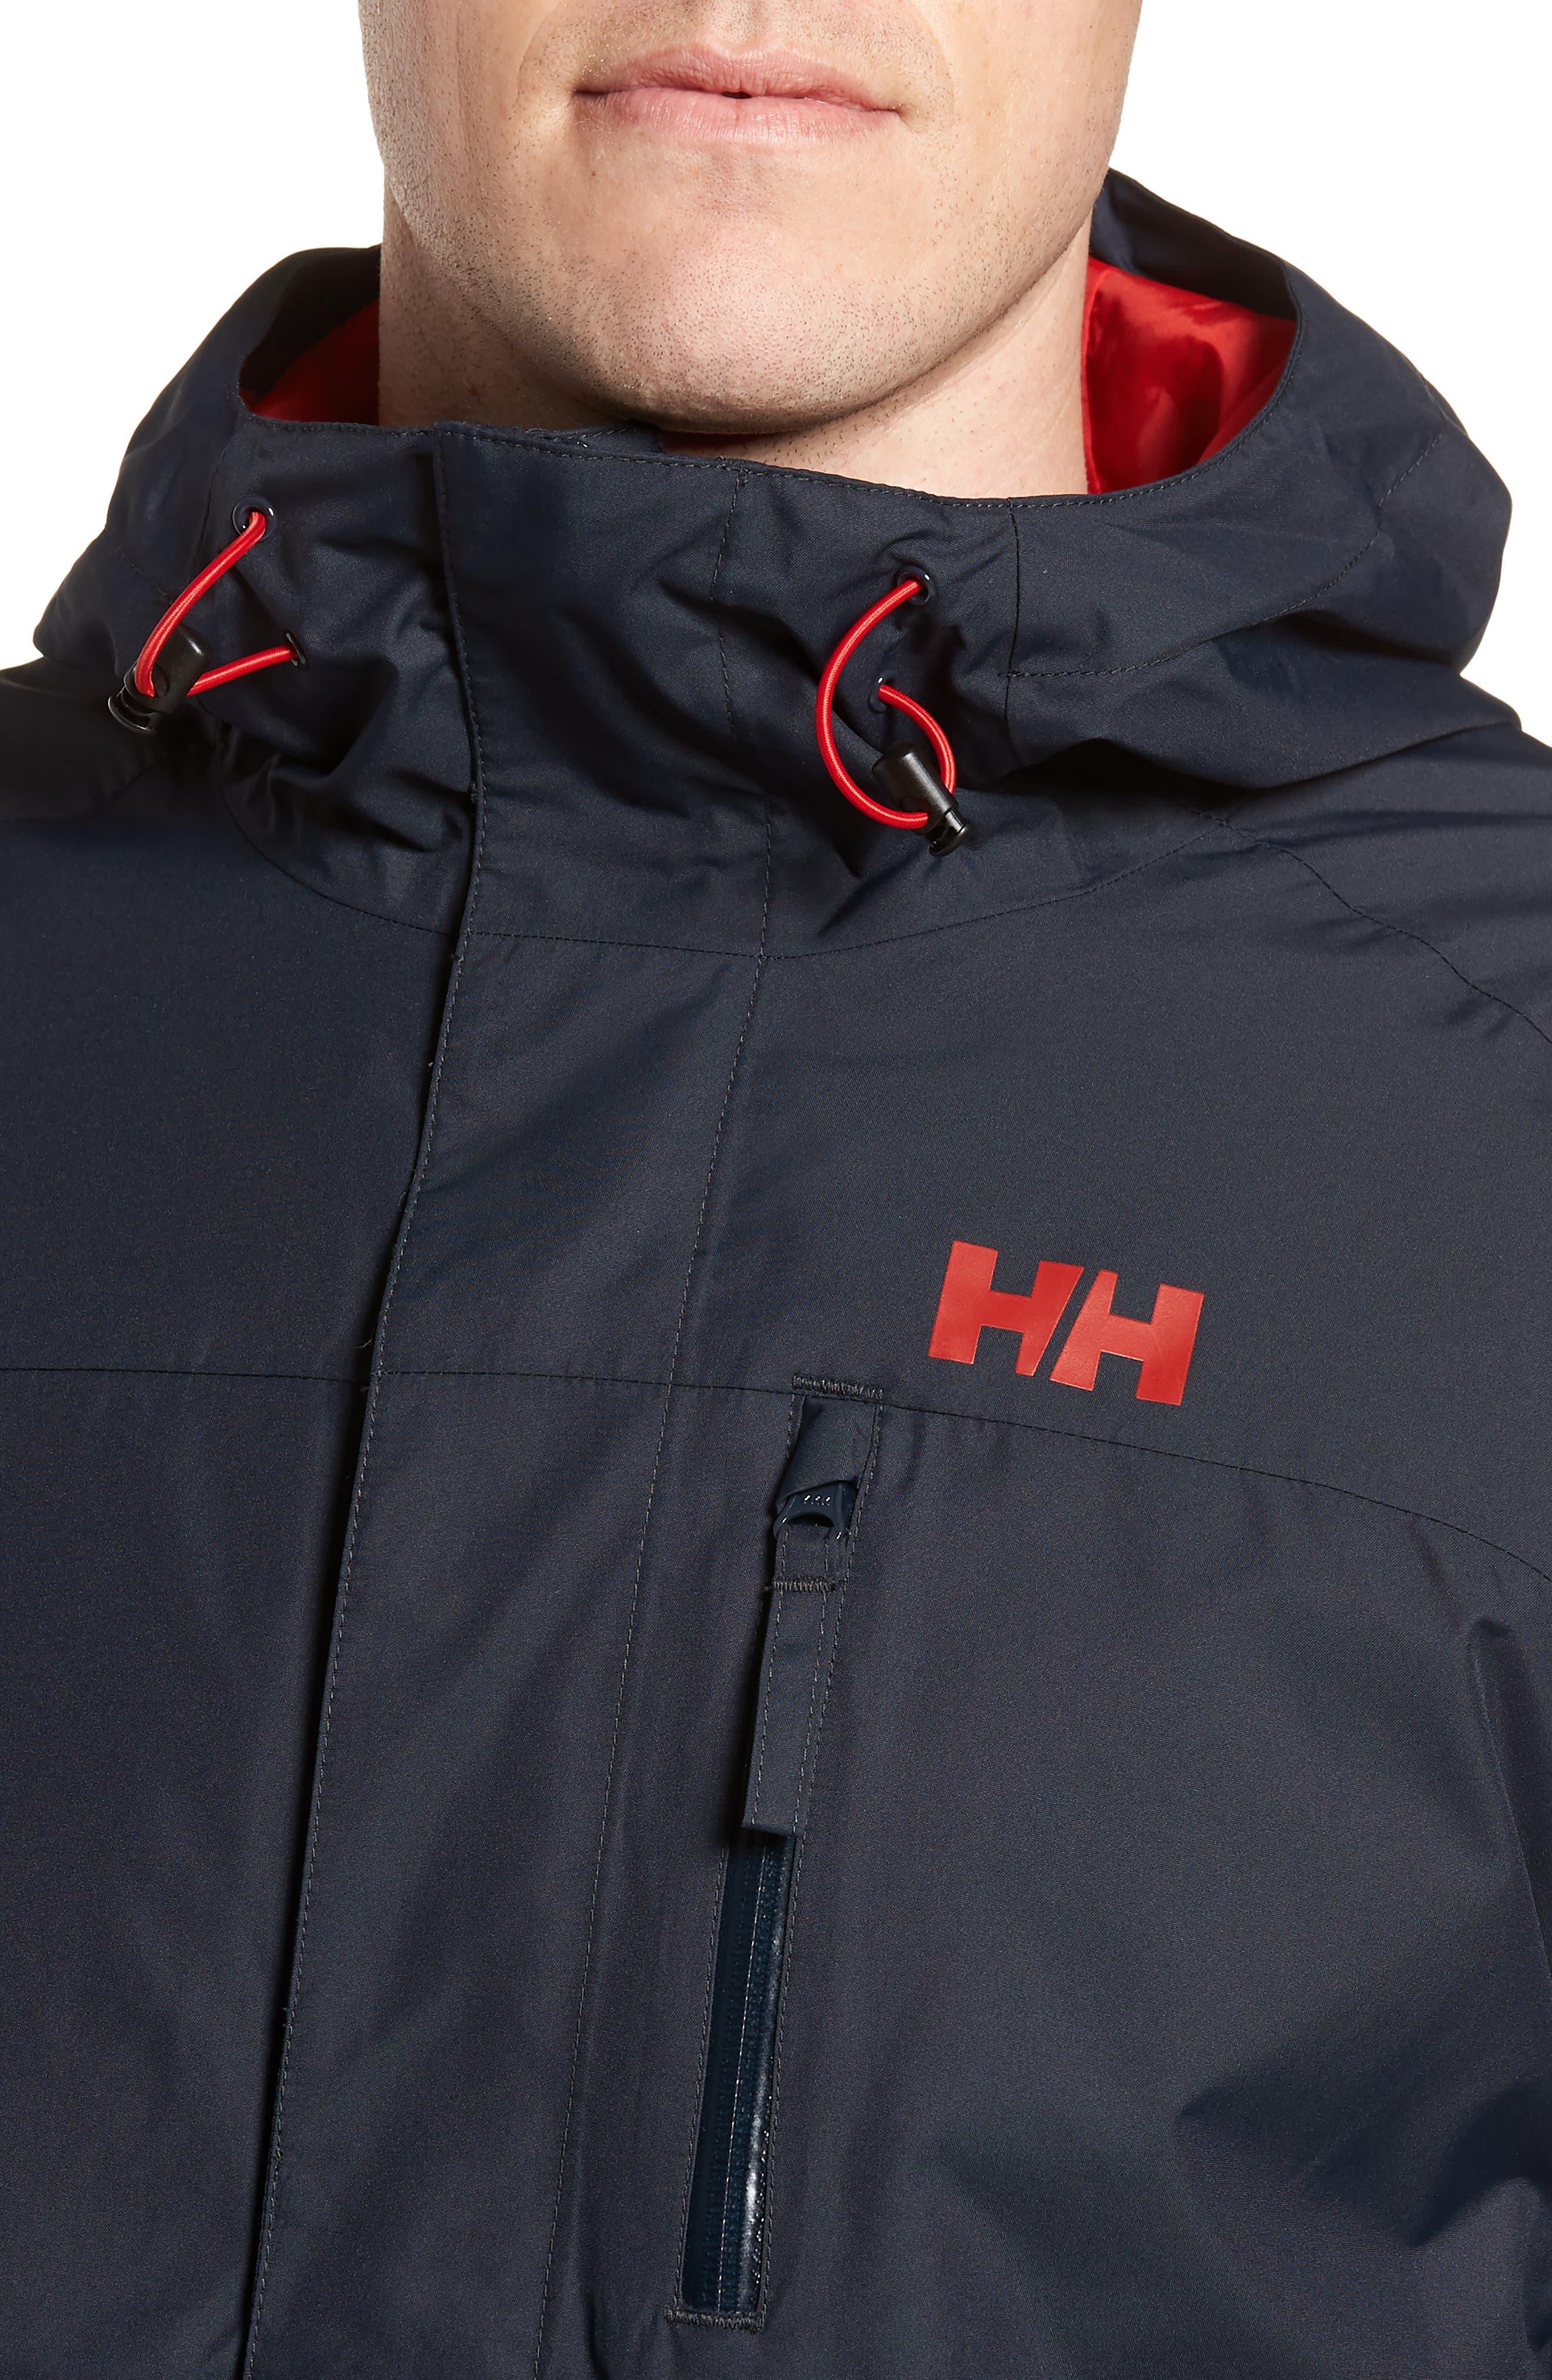 'Vancouver' Packable Rain Jacket,                             Alternate thumbnail 4, color,                             Navy/ Navy